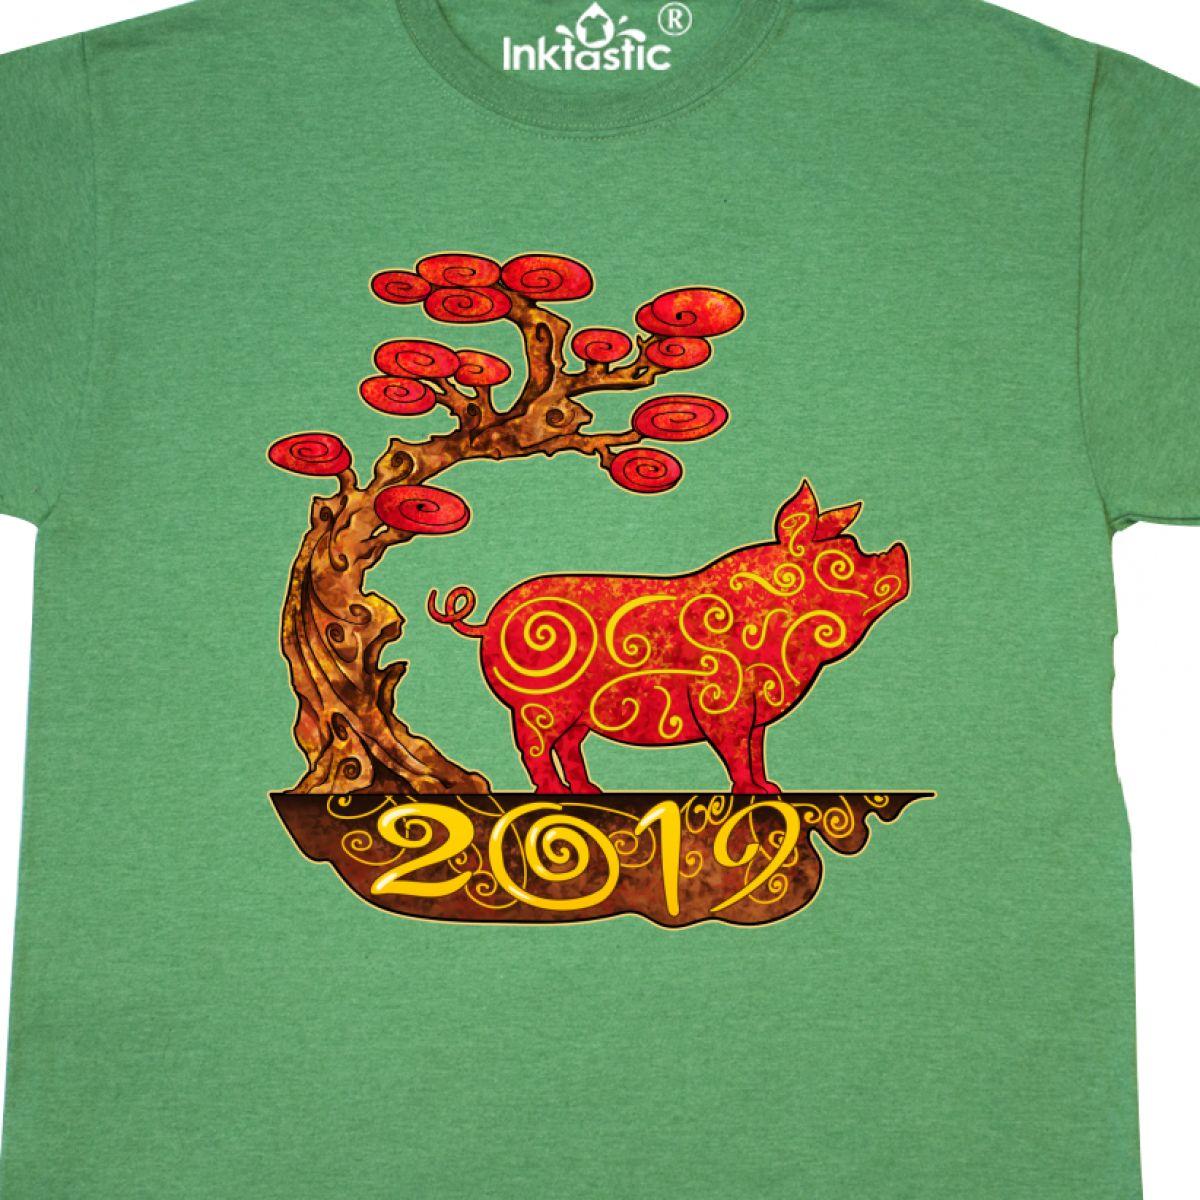 Inktastic-2019-Year-Of-The-Pig-T-Shirt-Years-Chinese-Zodiac-Symbol-Animal-Fun